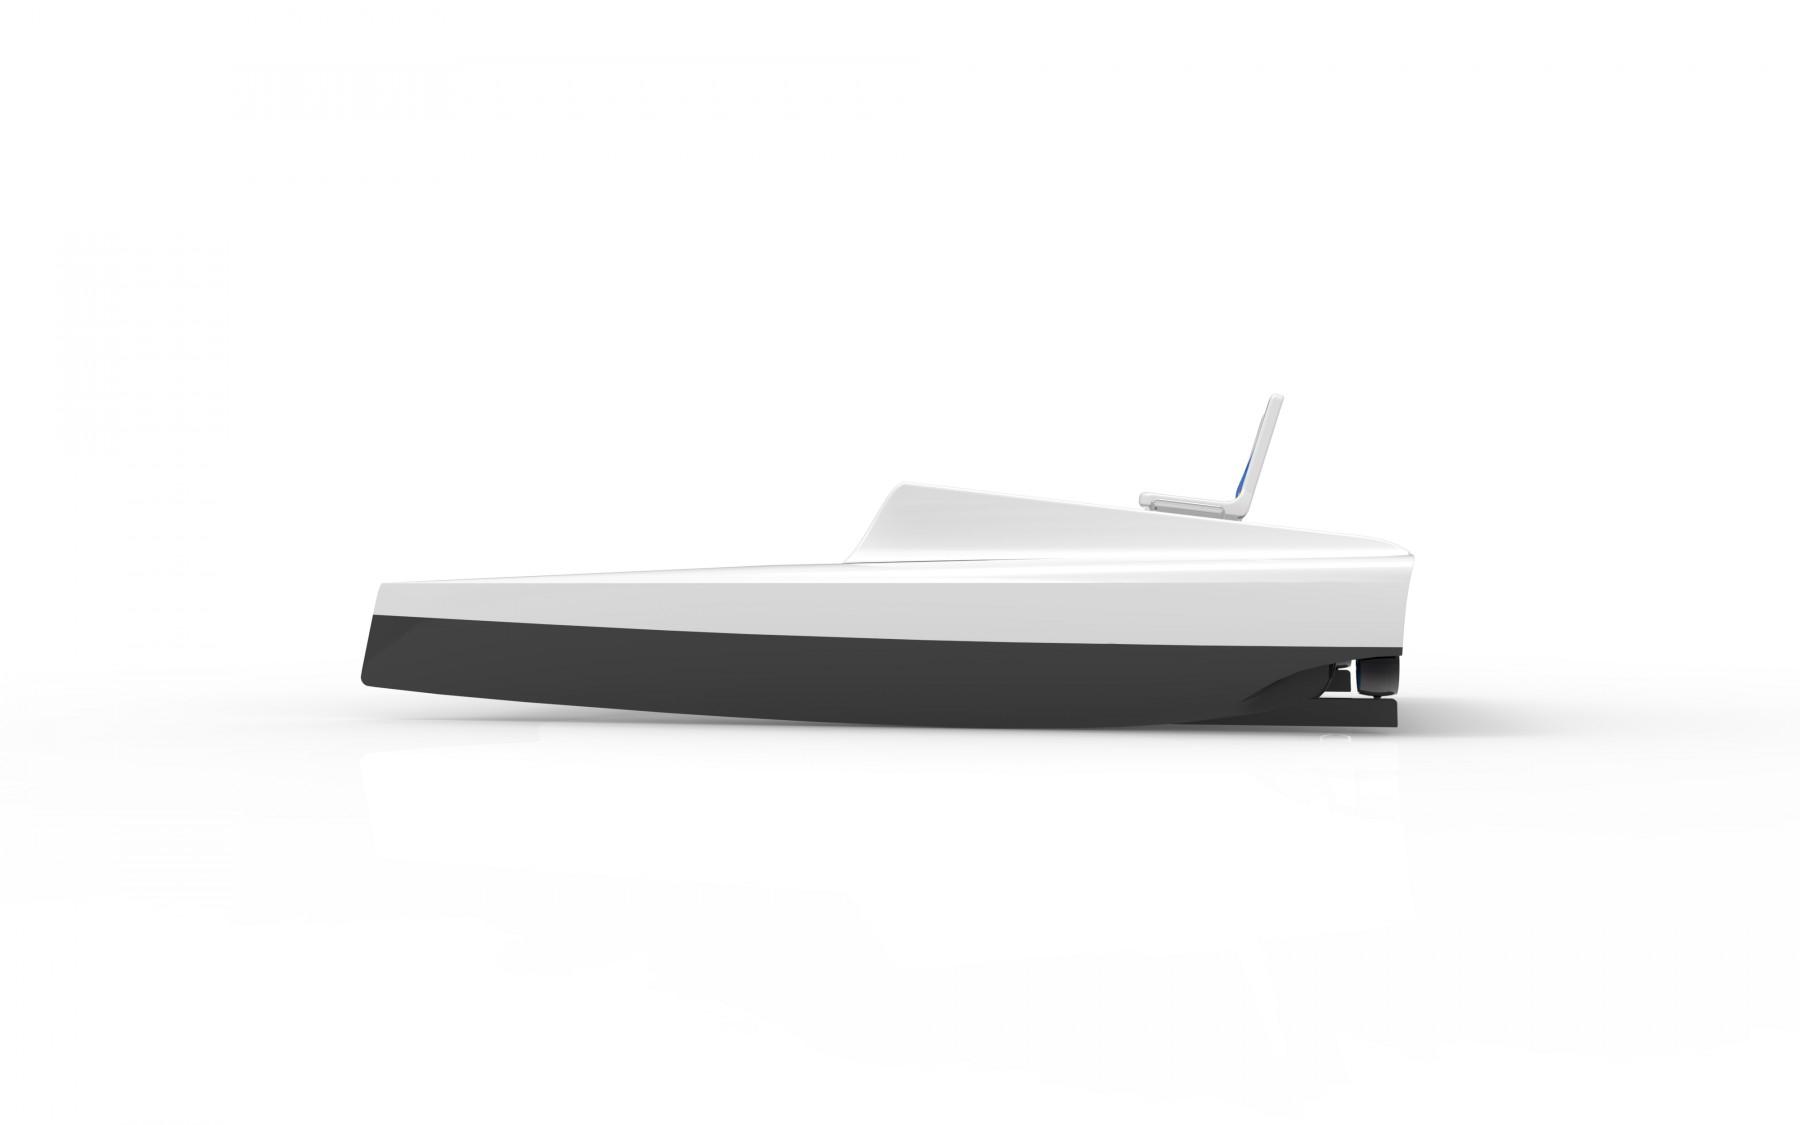 Katamarantretboot produktdesign for Studium produktdesign